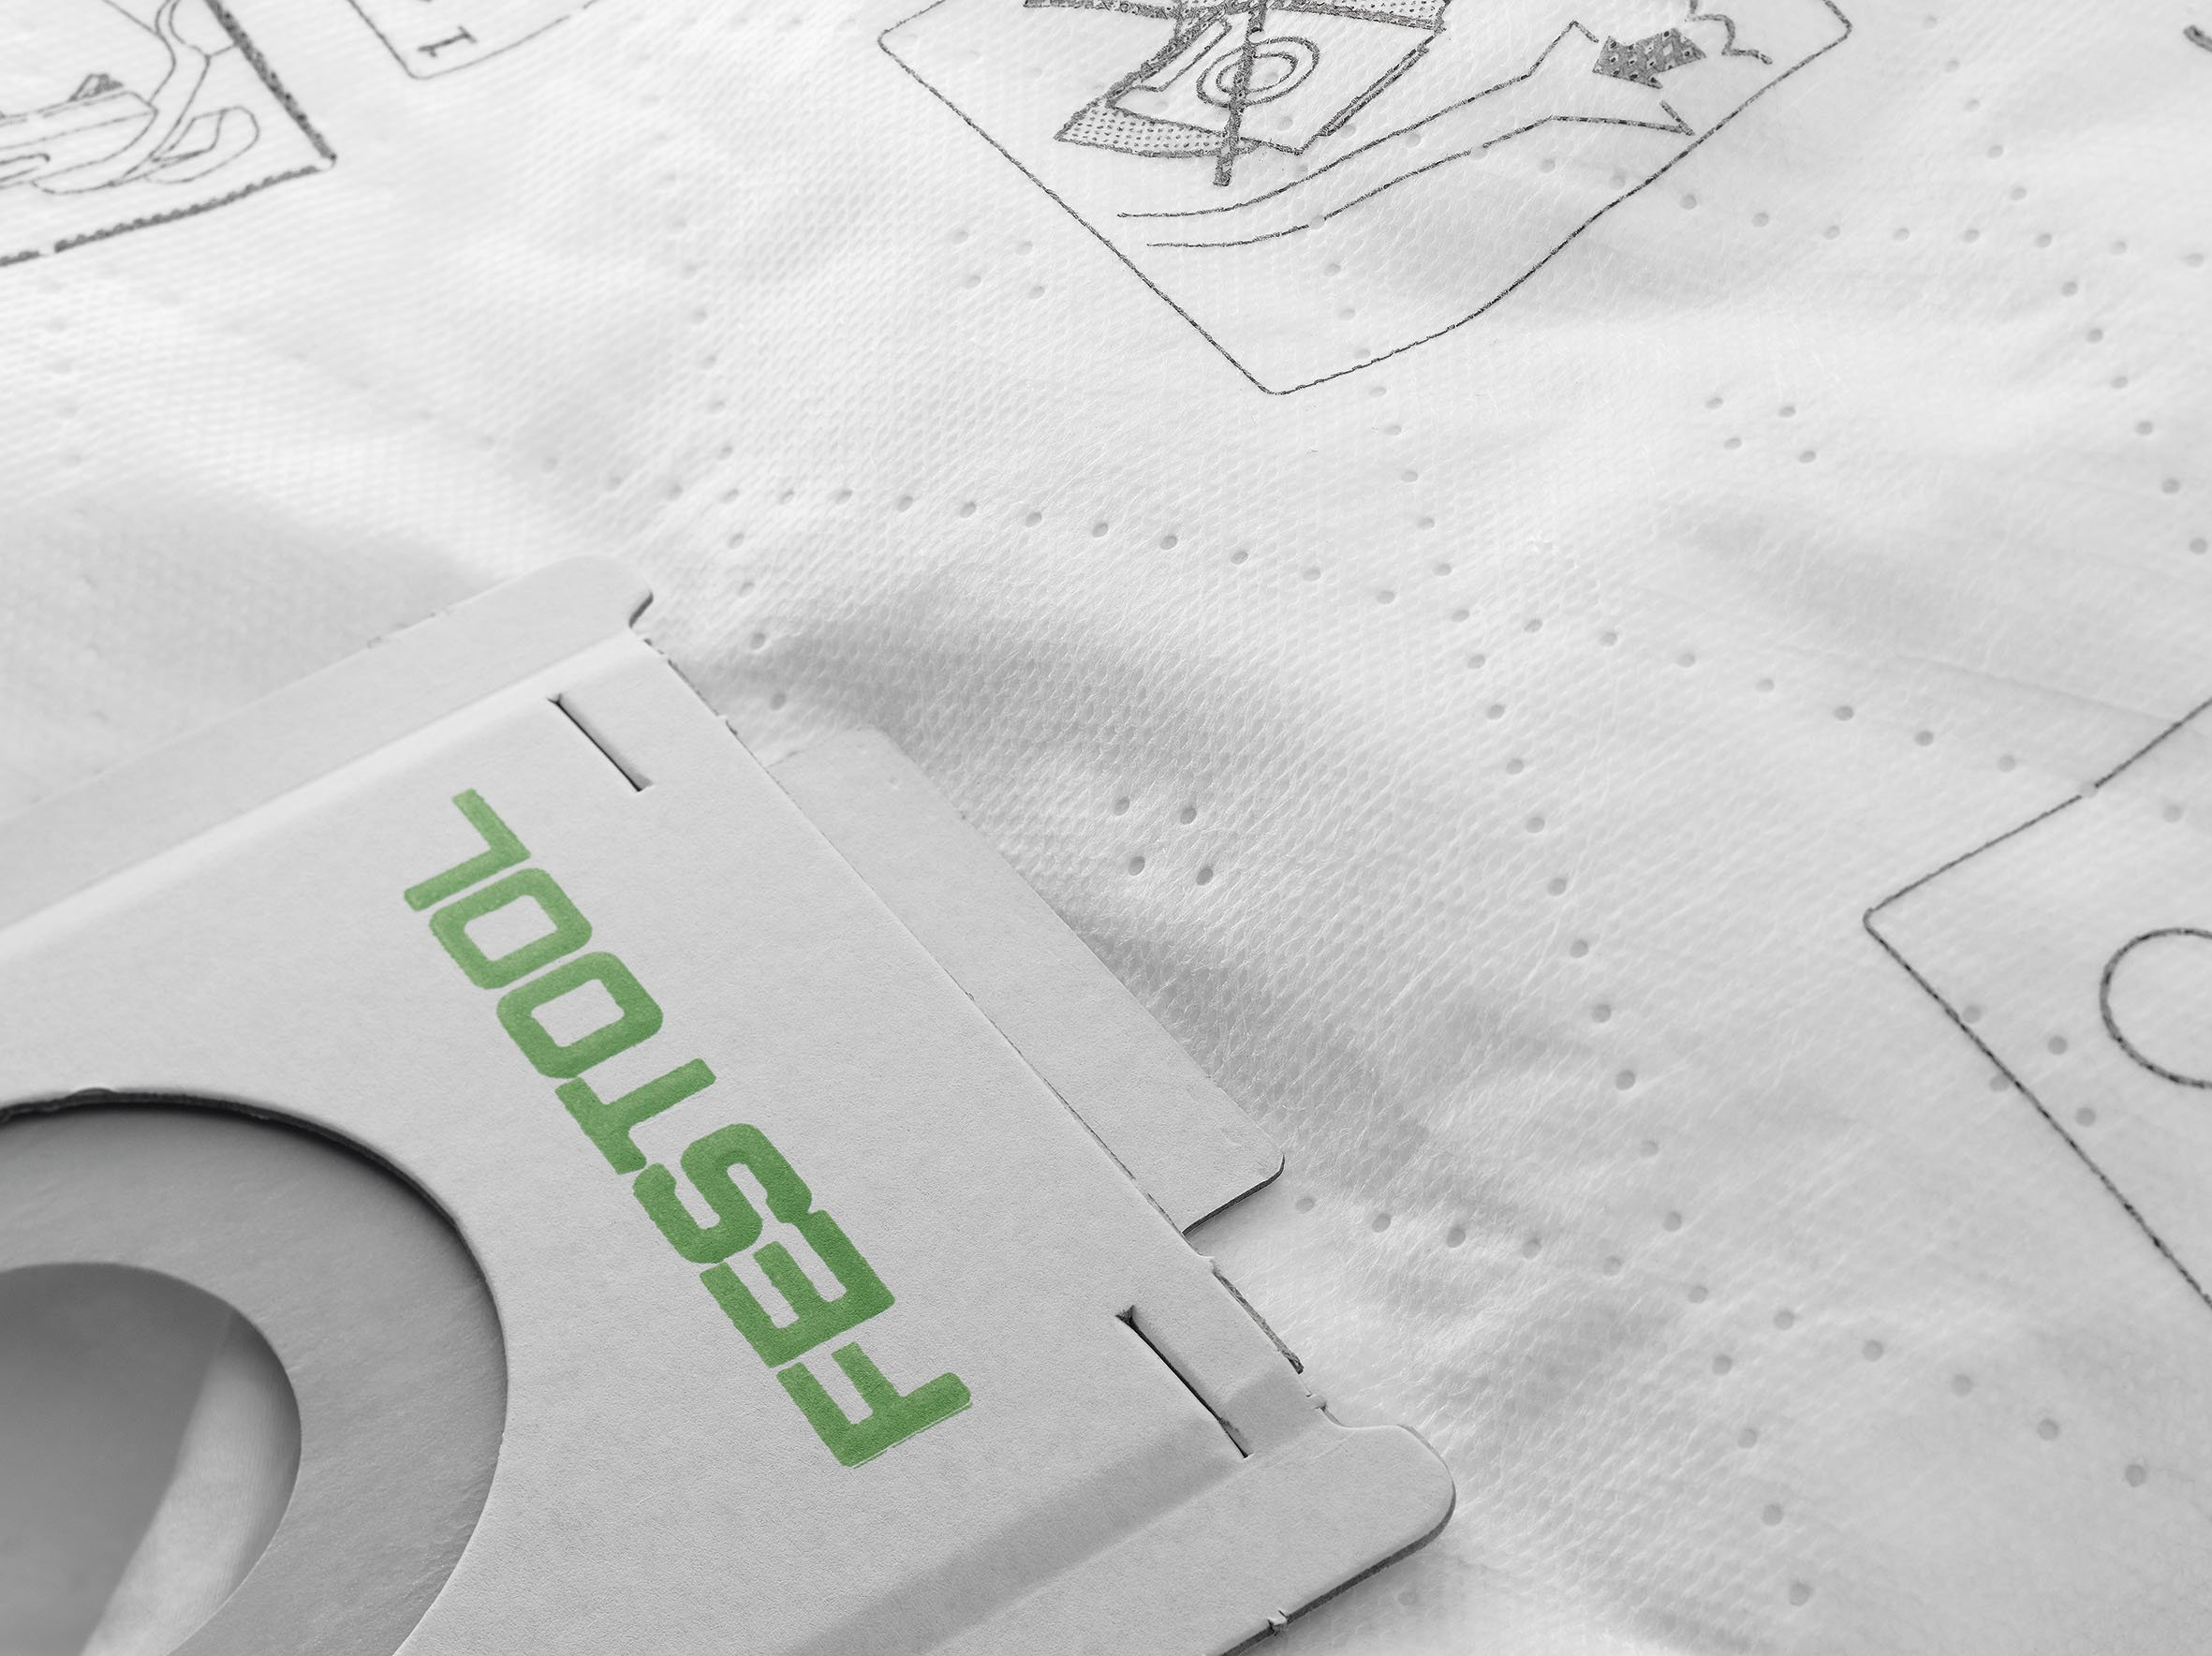 Festool 496187 Selfclean Filter Bag For CT 26, Quantity 5